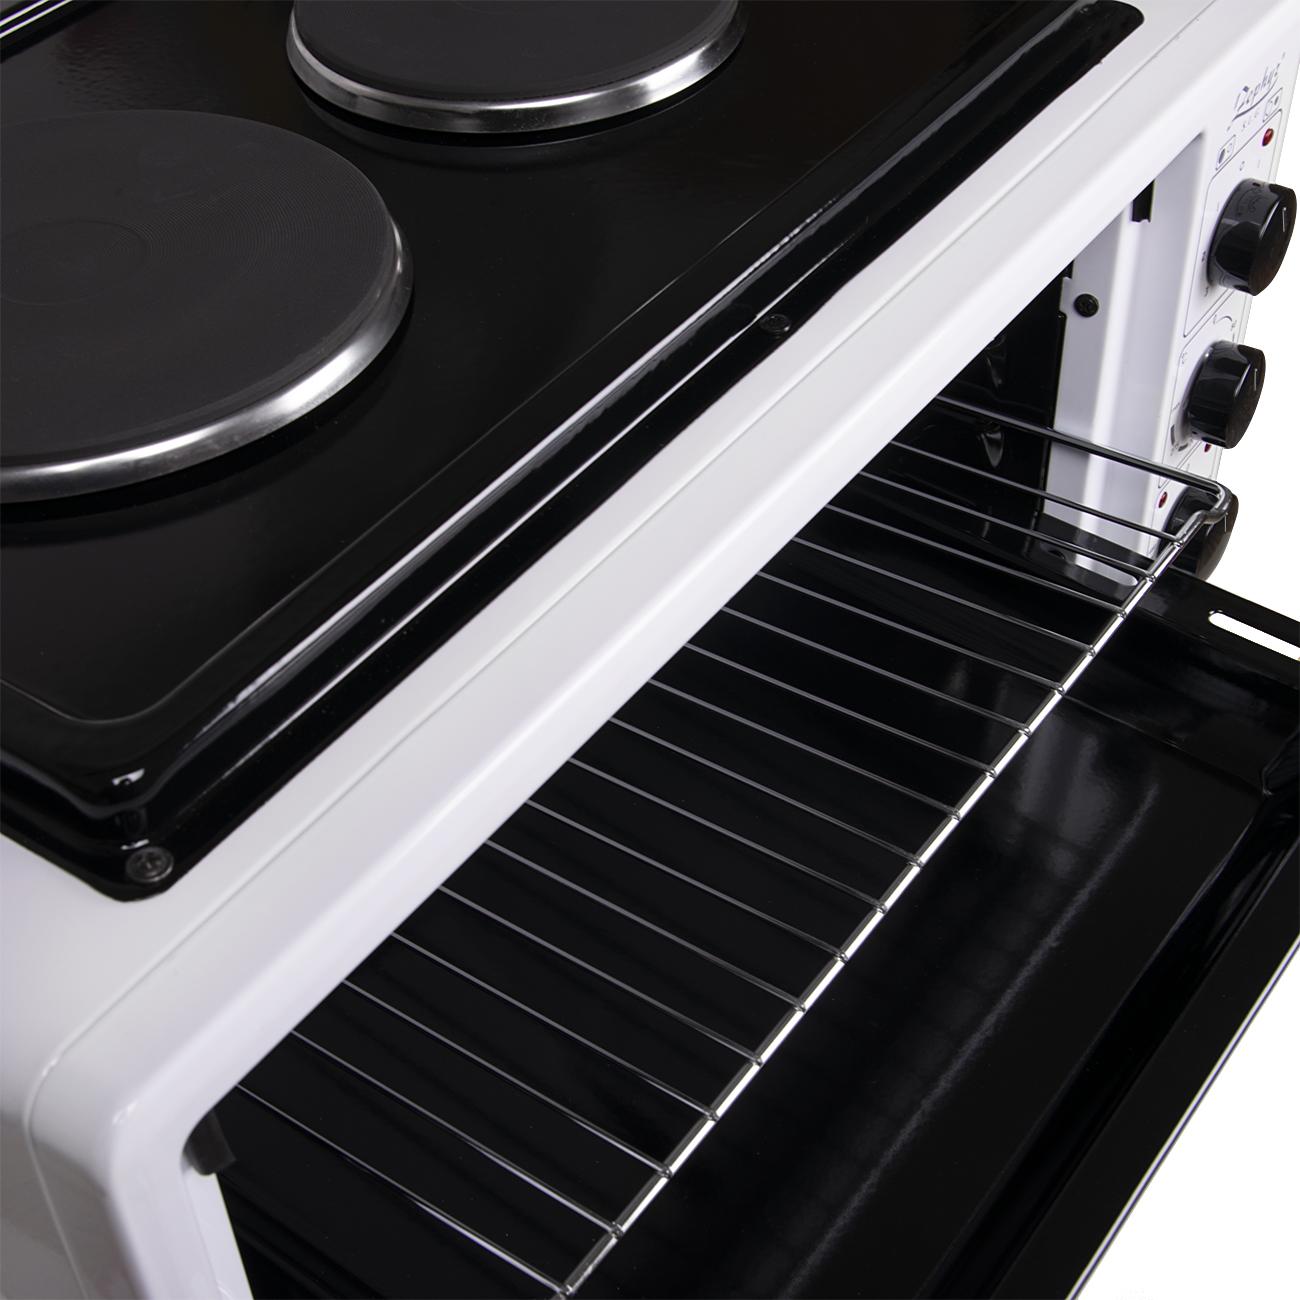 Готварска печка с фурна и два котлона ZEPHYR ZP 1441 T450HP